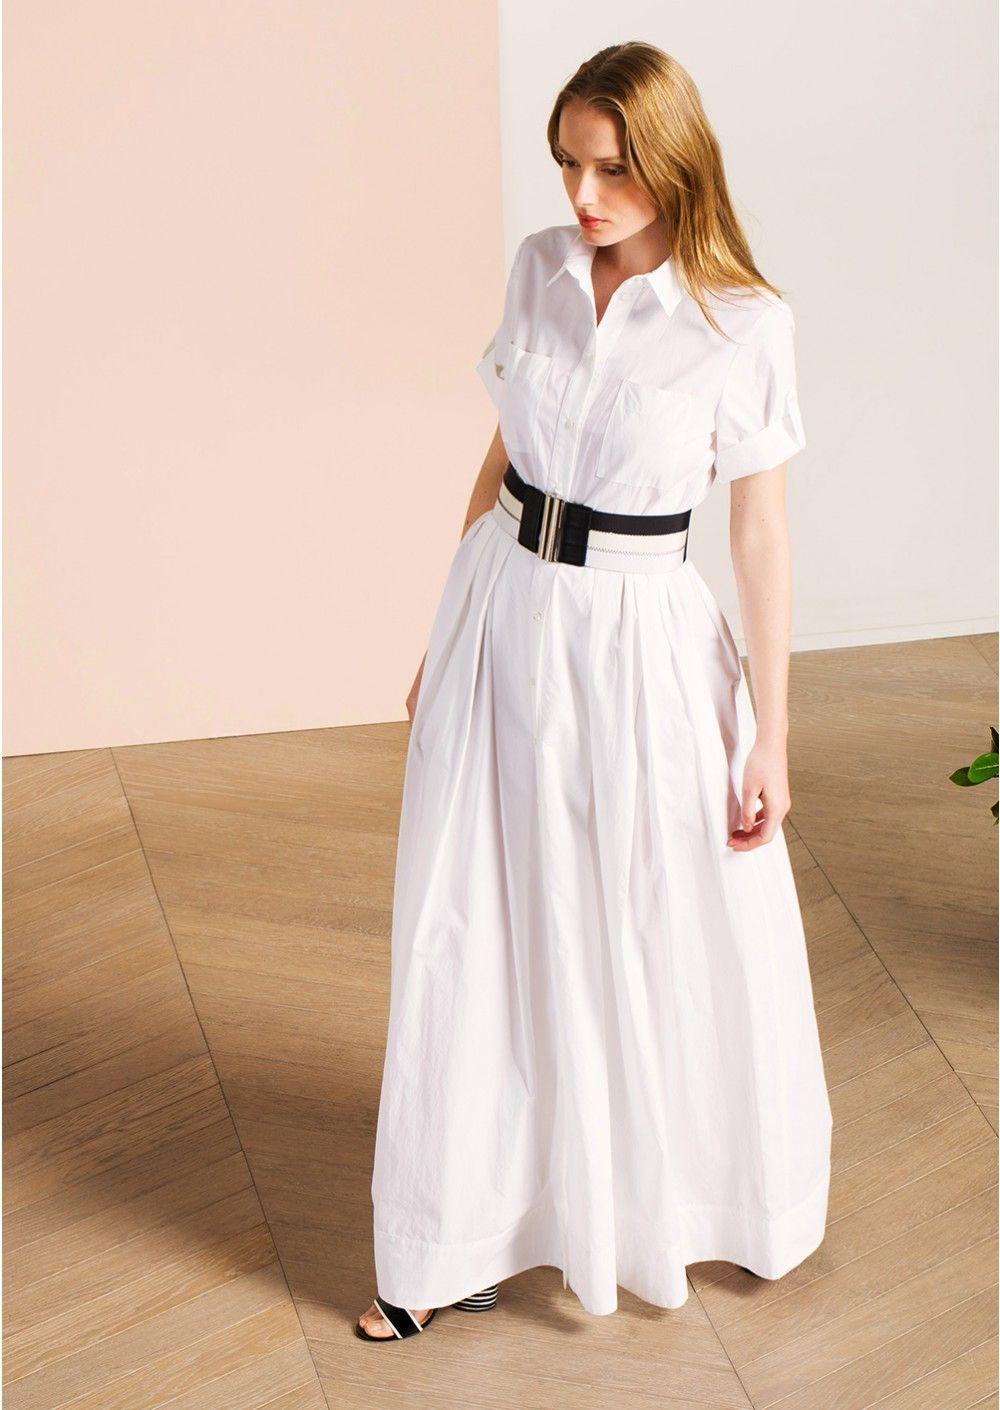 3 Jarmon De Tara Coton Chemise Longue En Femme Robe Popeline 3ARL54j